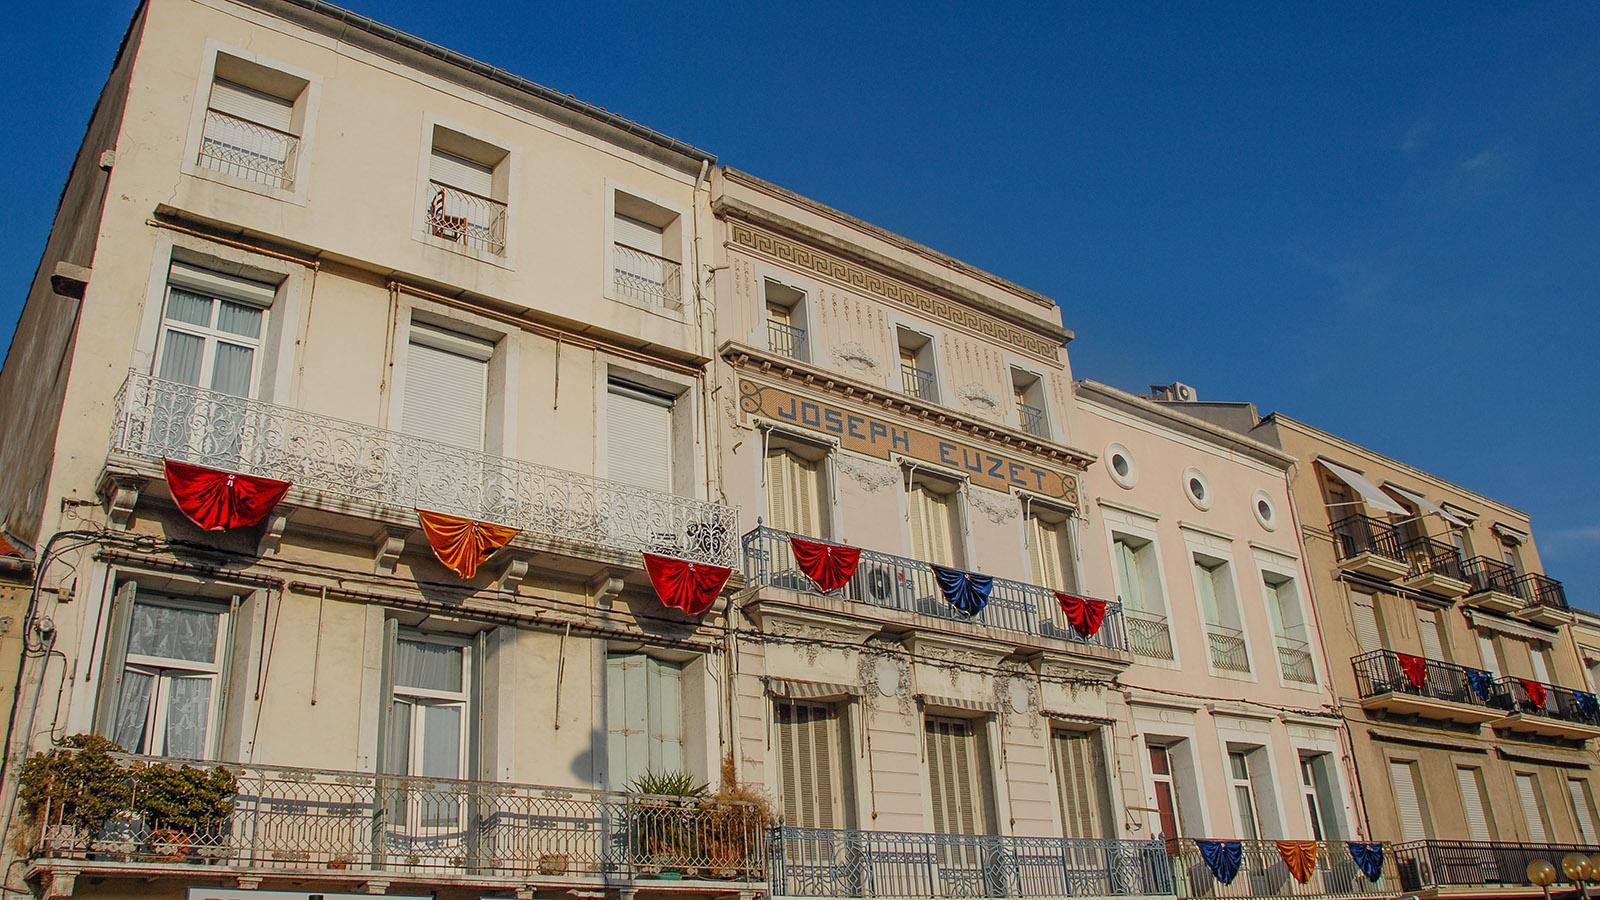 Sète: fürs Fischerfest geschmückt: die Häuser am Hauptkanal. Foto: Hilke Maunder